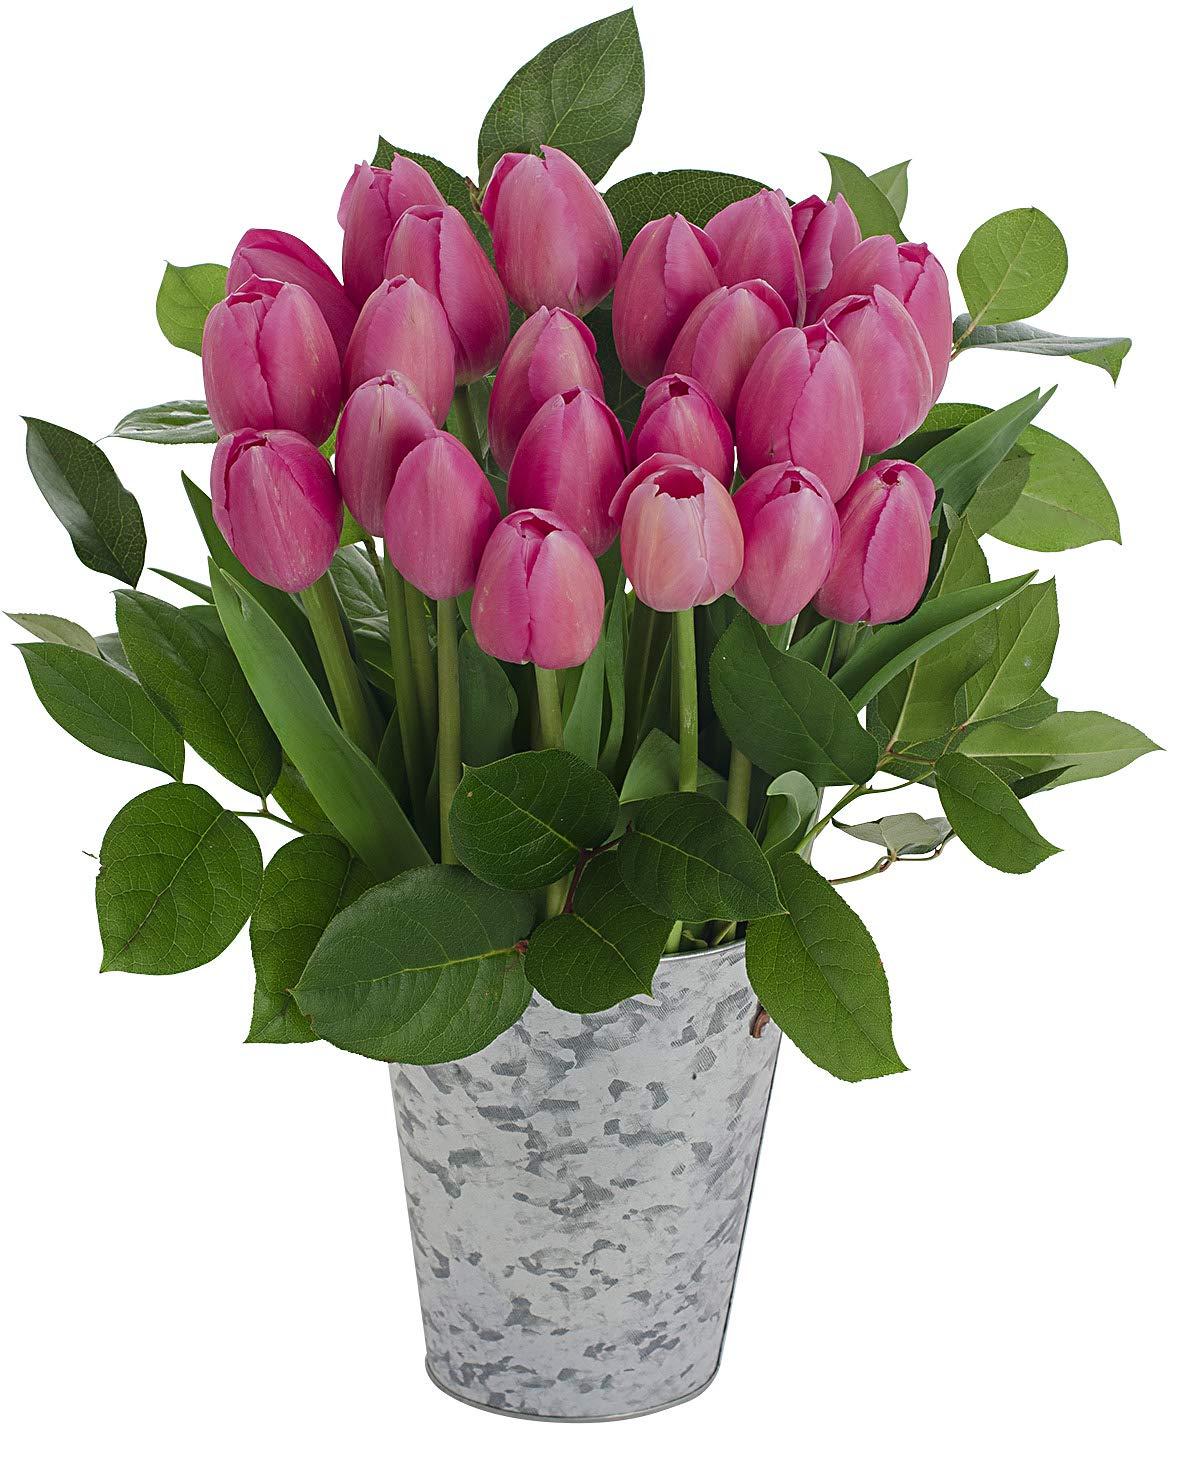 Stargazer Barn Flamenco Bouquet 2 Dozen Bright Pink Tulips with French Bucket Style Vase